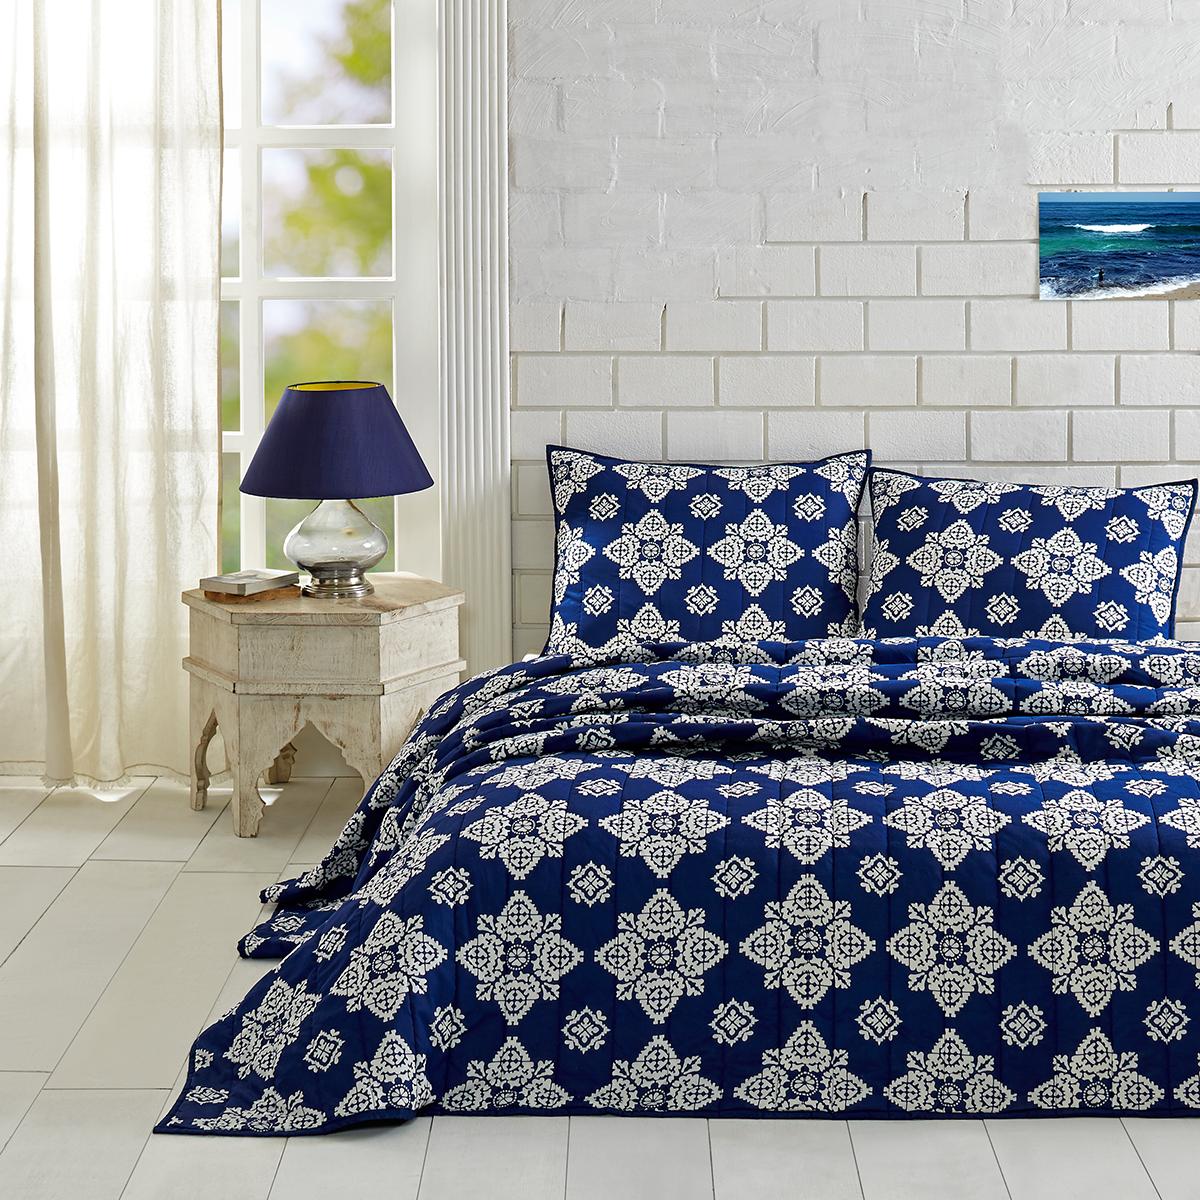 Adelaide Twilight Blue King Set; Quilt 95x105-2 Shams 21x37 ... : quilting shops adelaide - Adamdwight.com